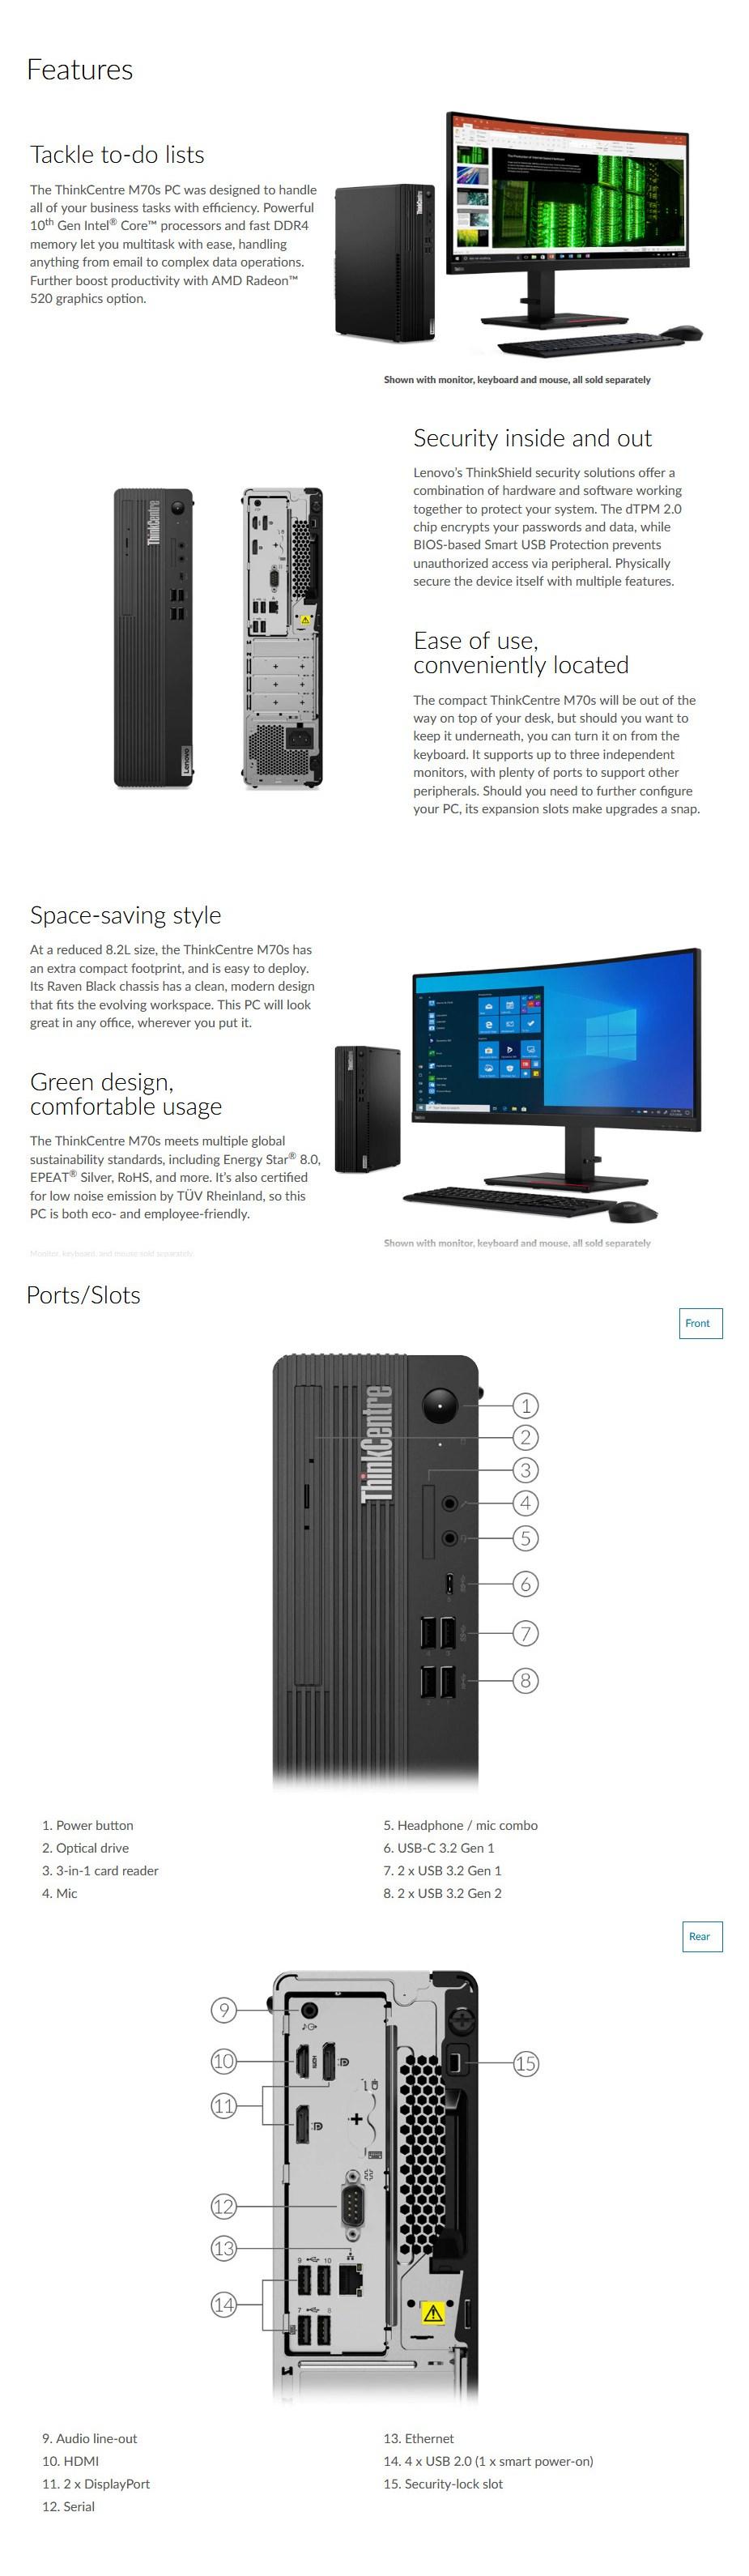 lenovo-m70s-sff-desktop-i510400-8gb-256gb-windows-10-pro-ac41107-5-2-.jpg